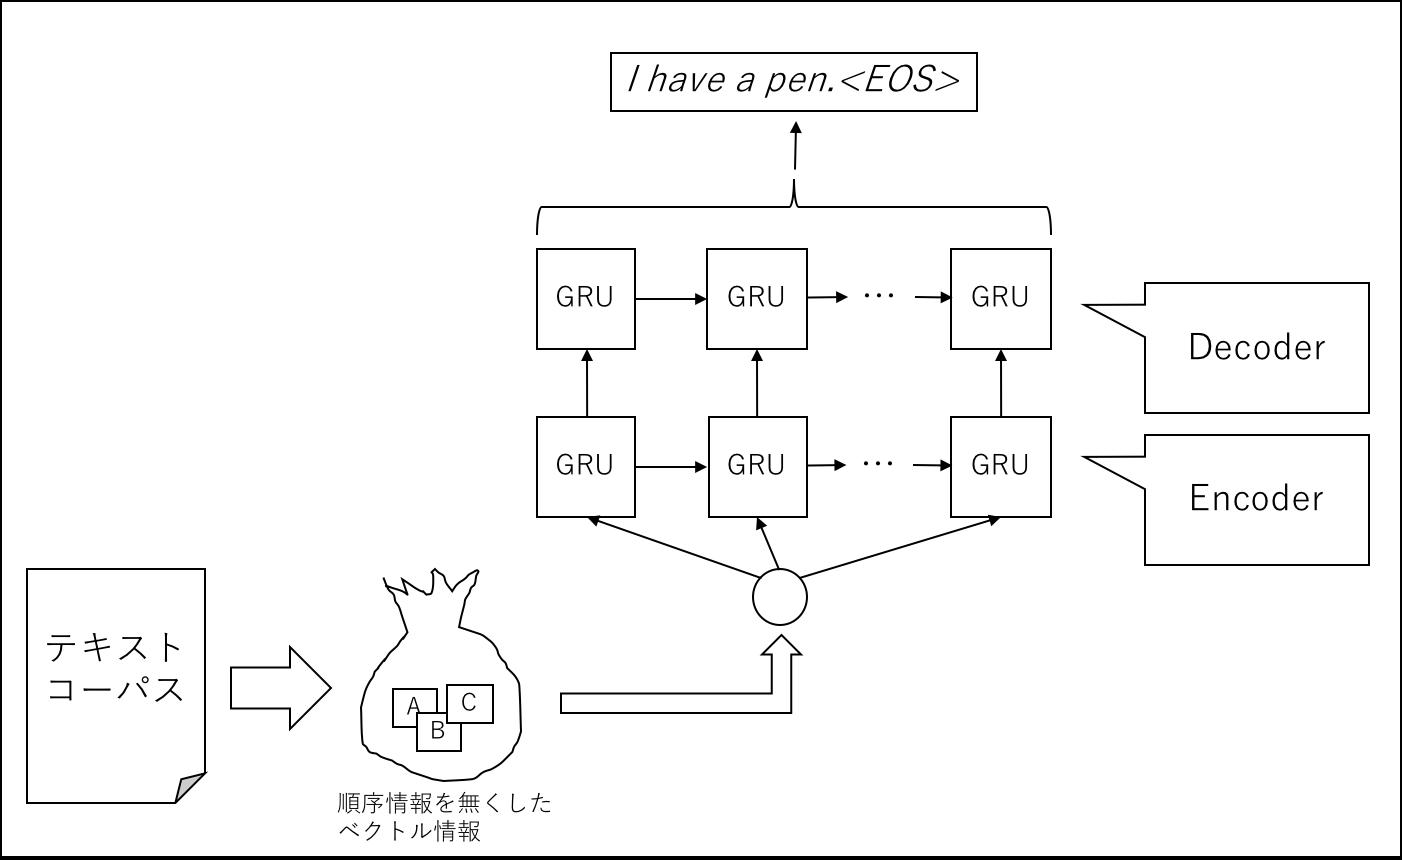 images · Issue #1 · GINK03/keras-seq2seq-sort · GitHub